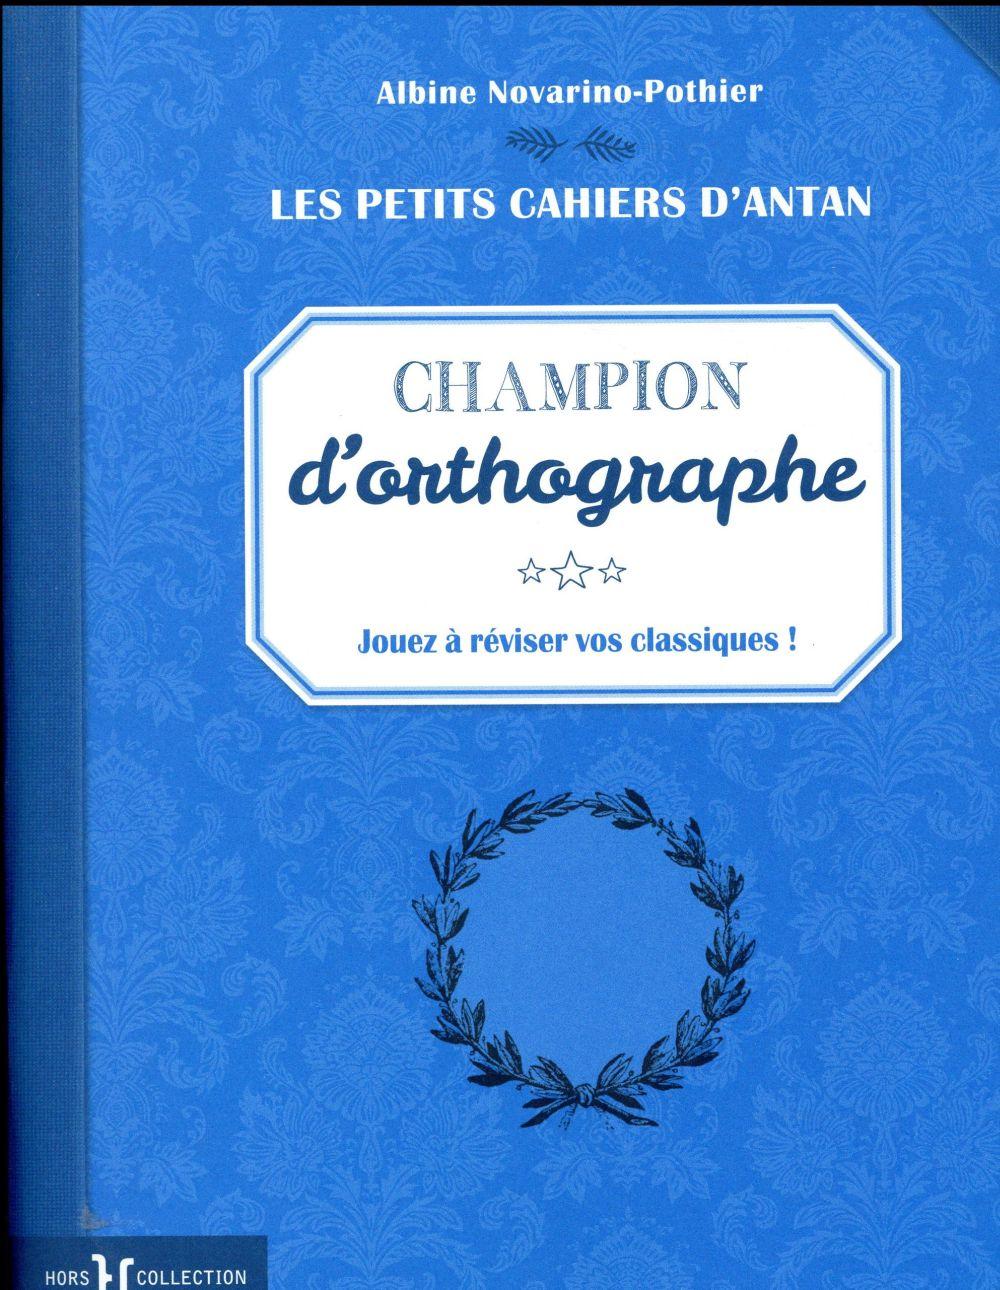 LES PETITS CAHIERS D'ANTAN CHAMPION D'ORTHOGRAPHE Novarino-Pothier Albine Hors collection